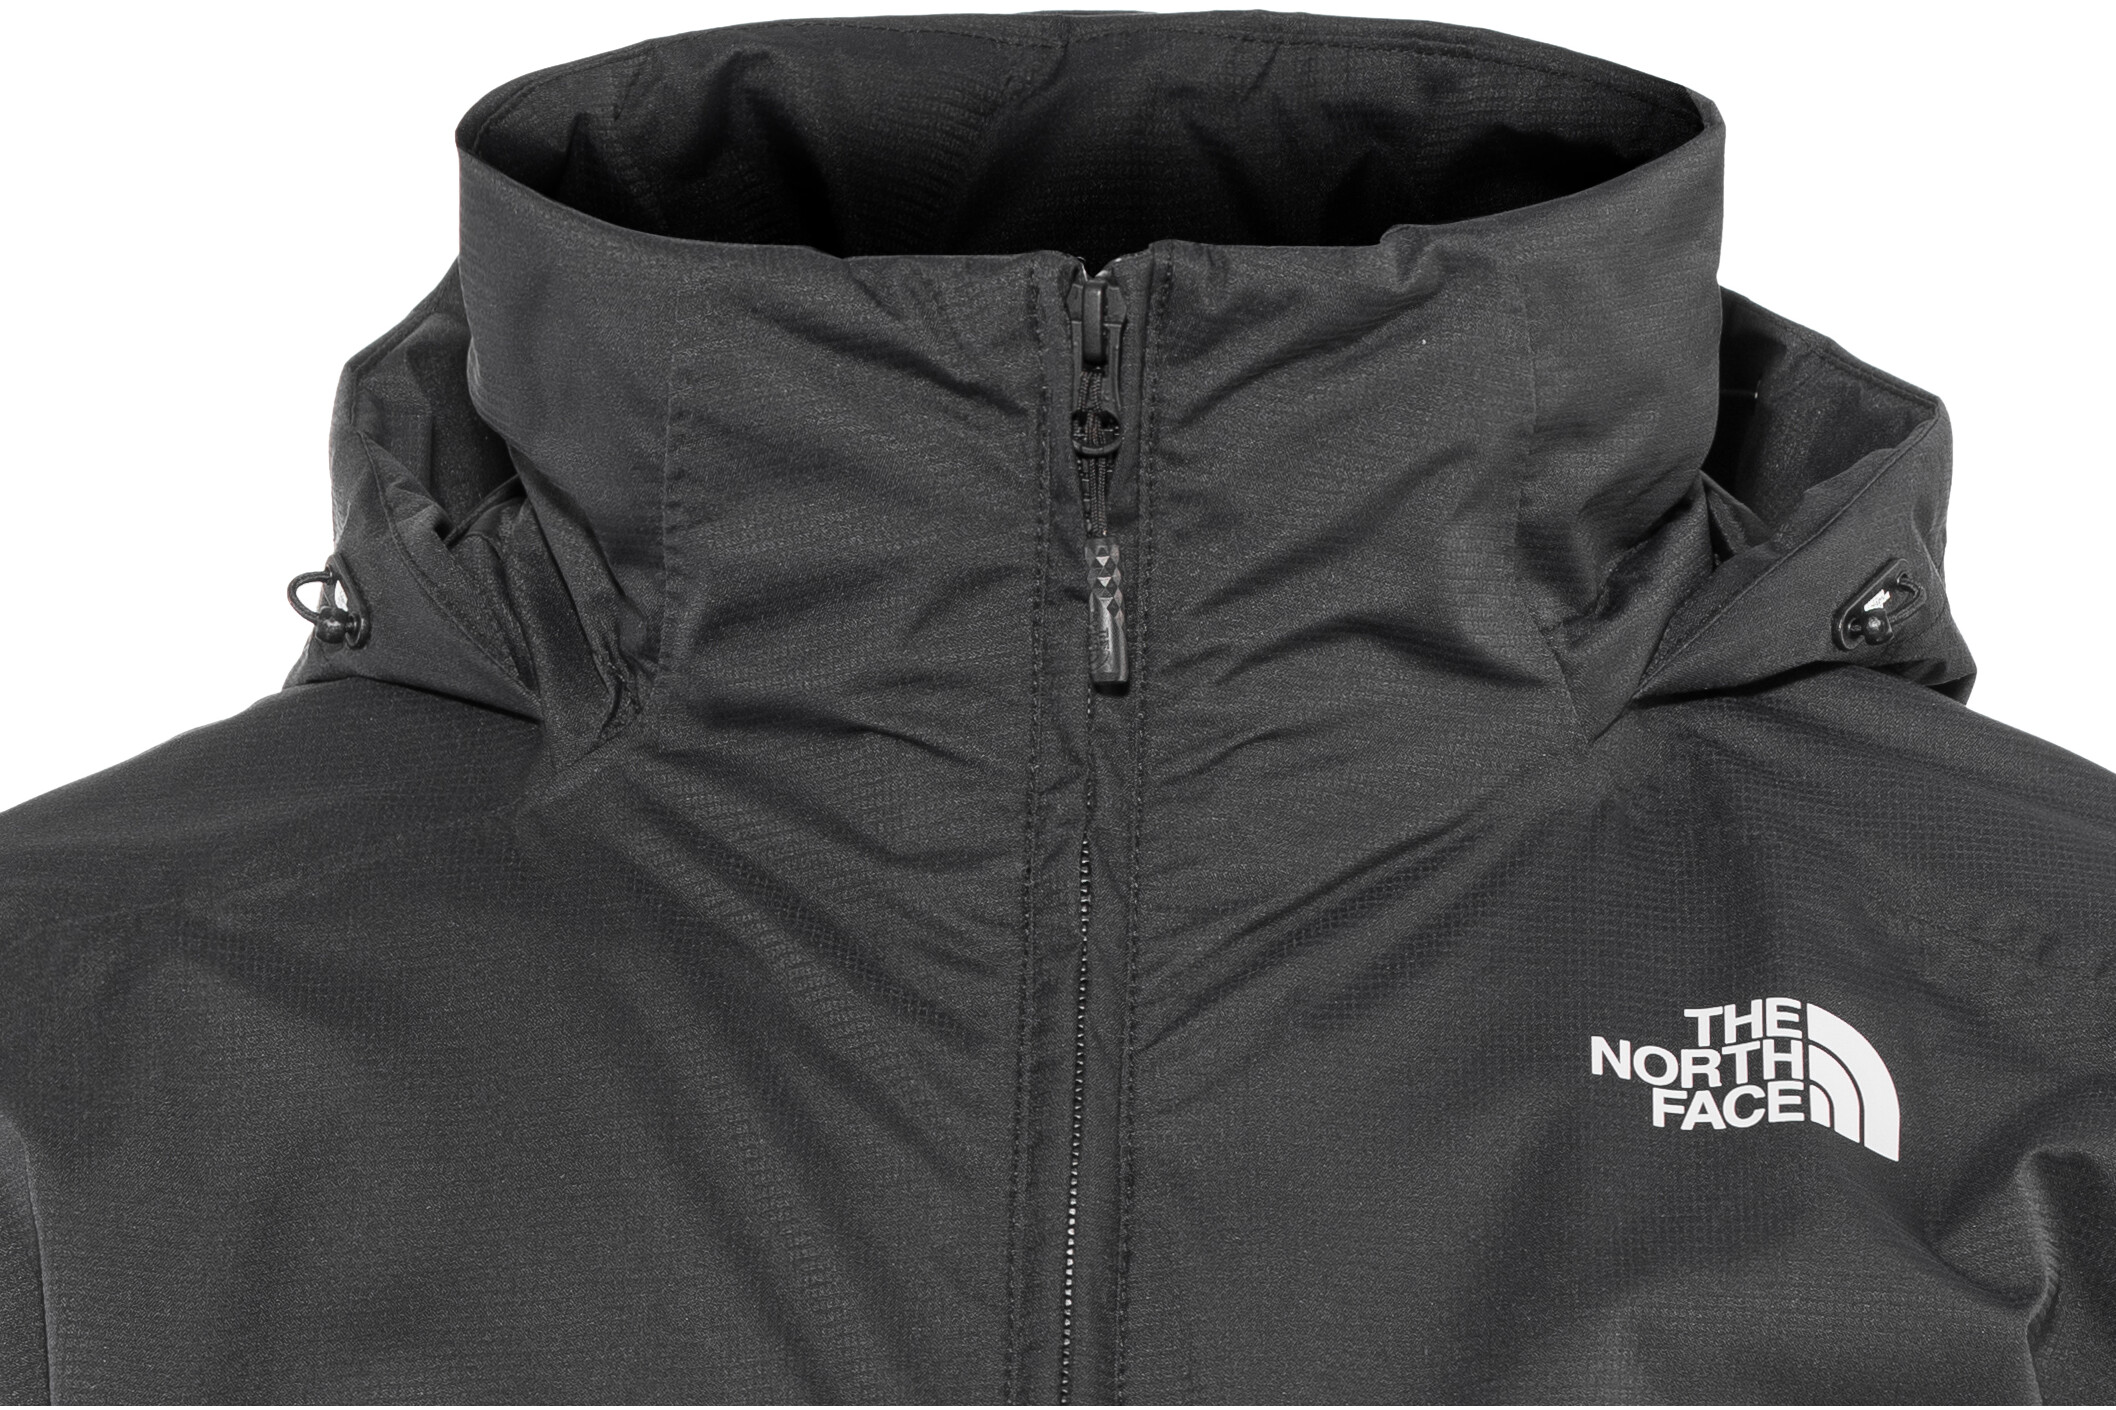 ff55838da The North Face Frost Peak II Jacket Men tnf black